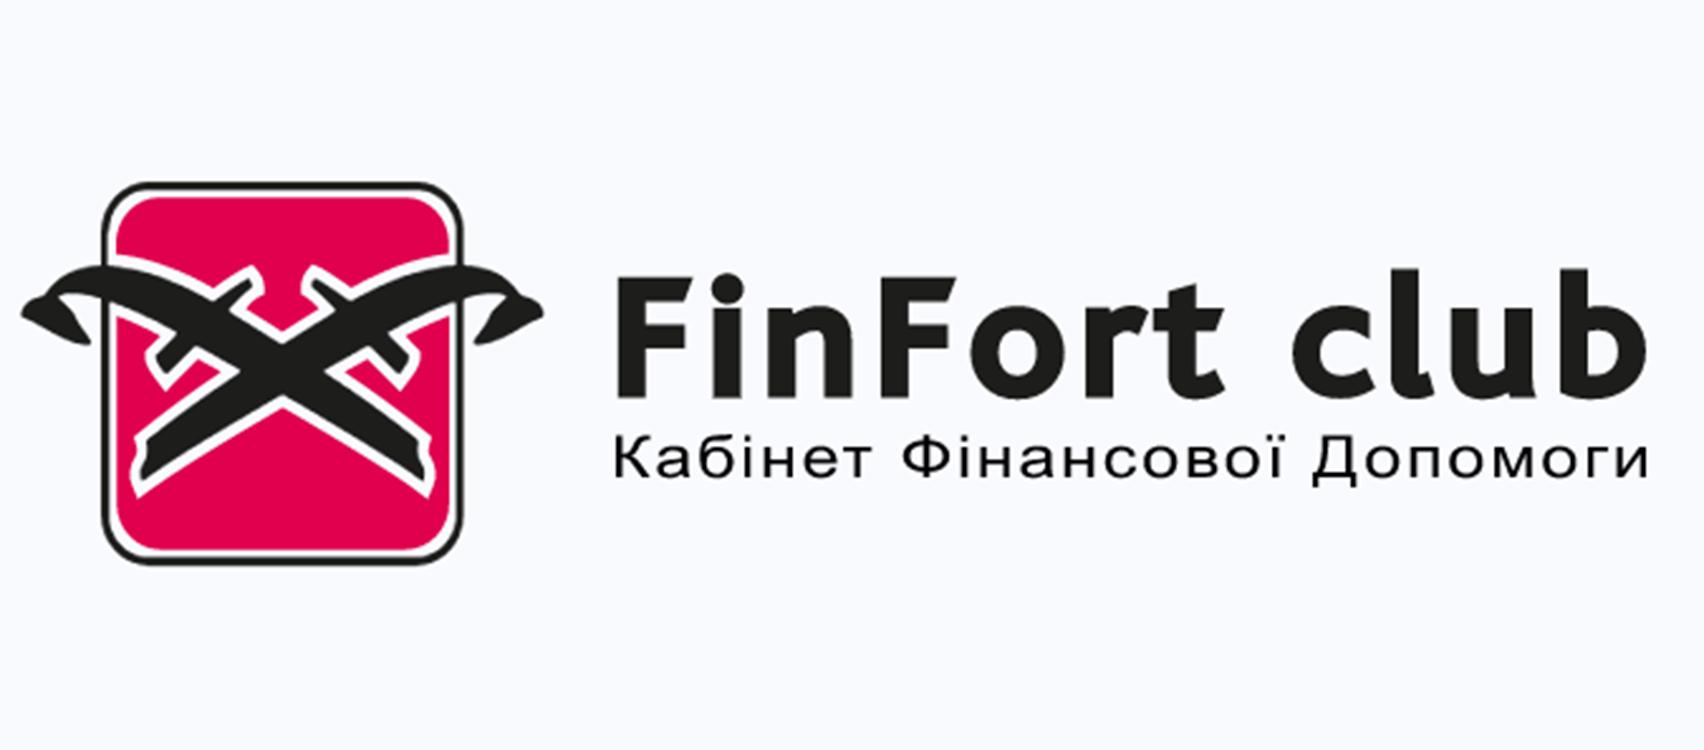 FinFort club